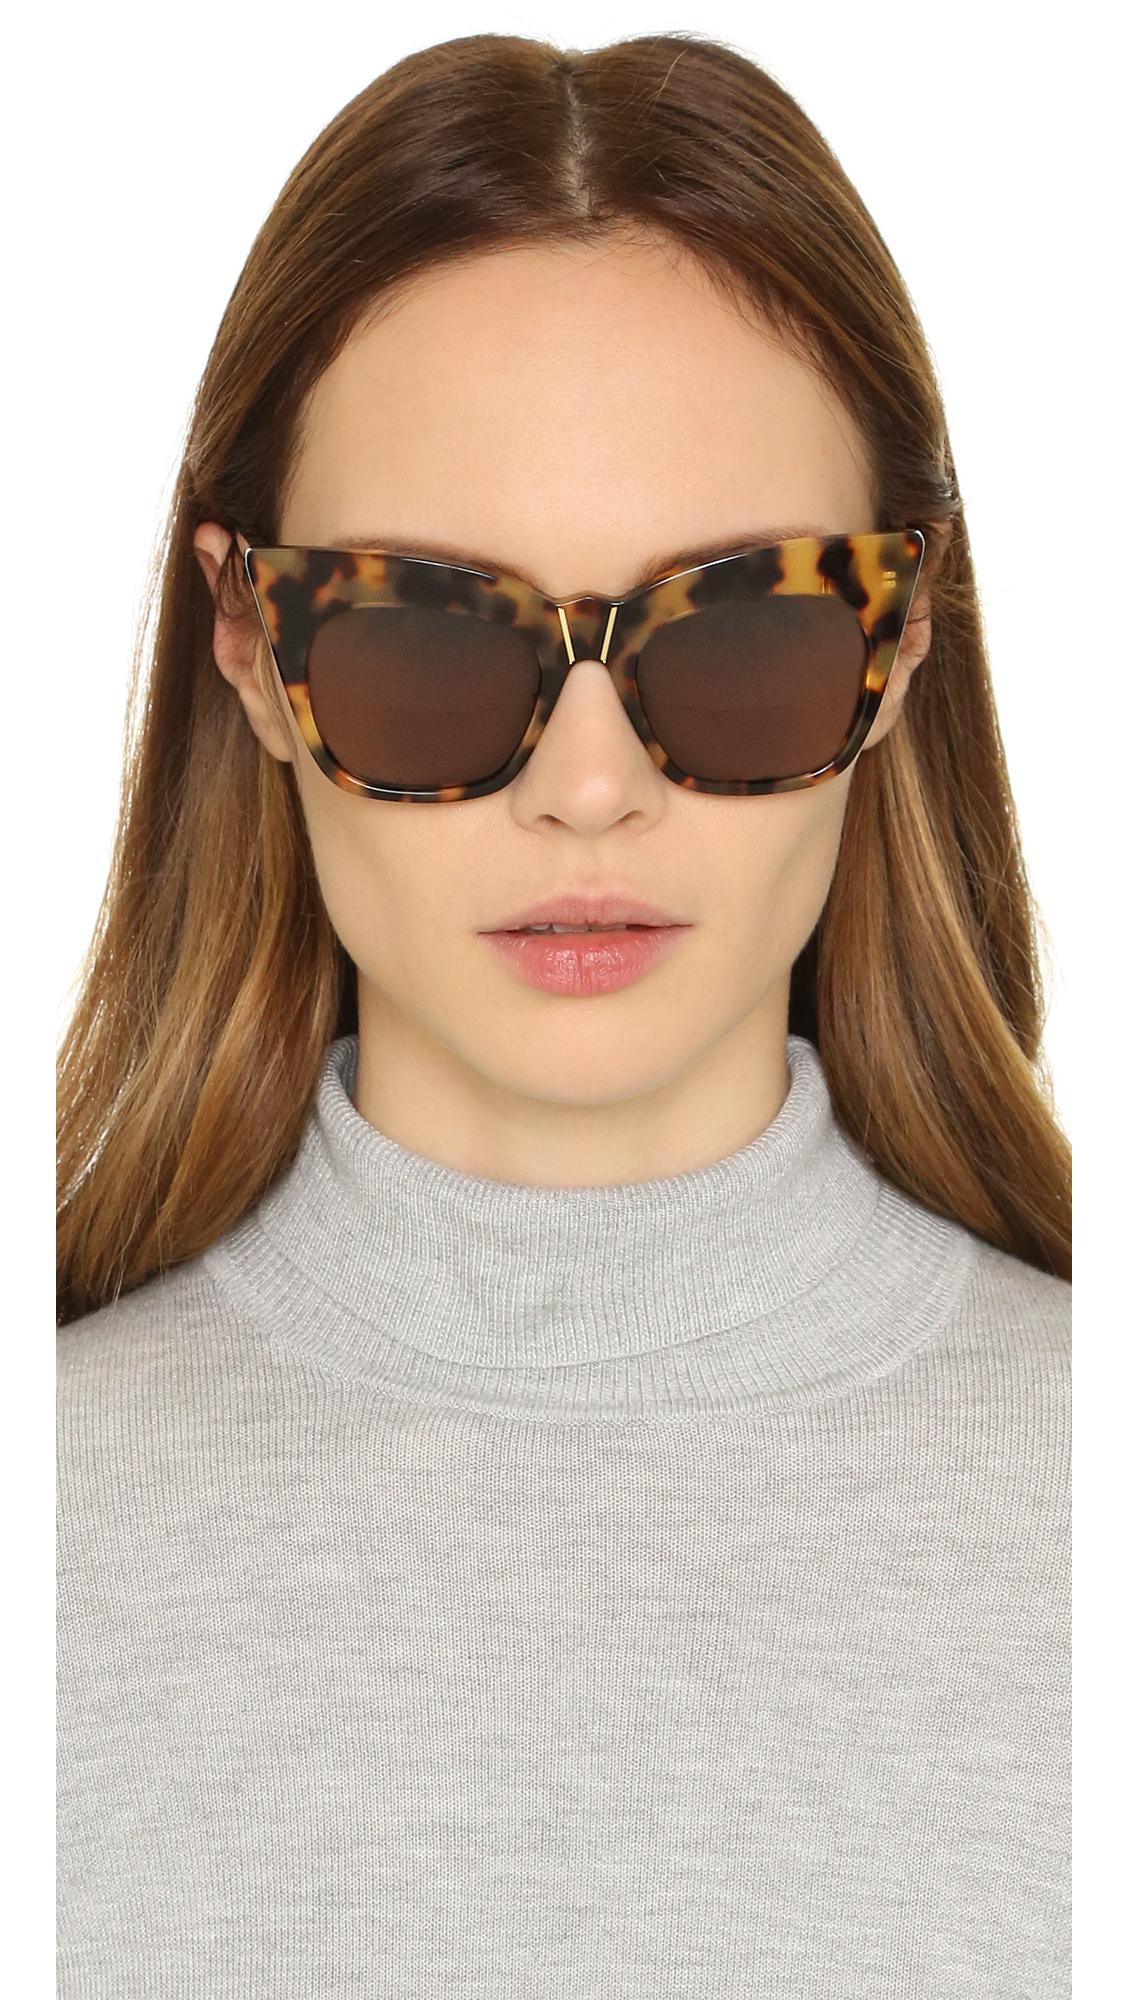 Kohl & Kaftans sunglasses - Brown Pared Eyewear NTYivO